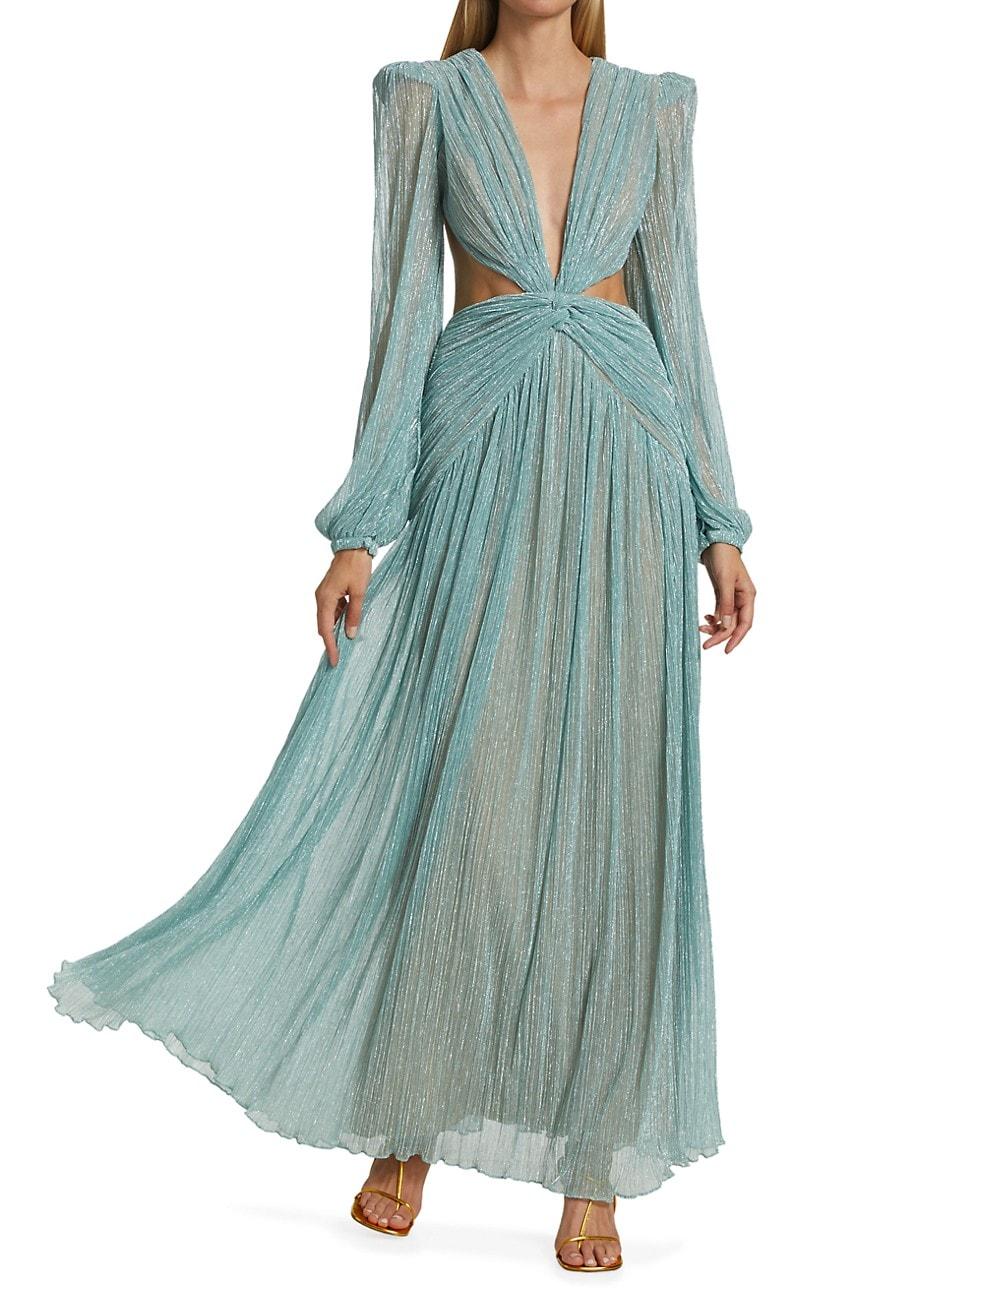 Sea foam green shimmery long sleeve gown for summer.